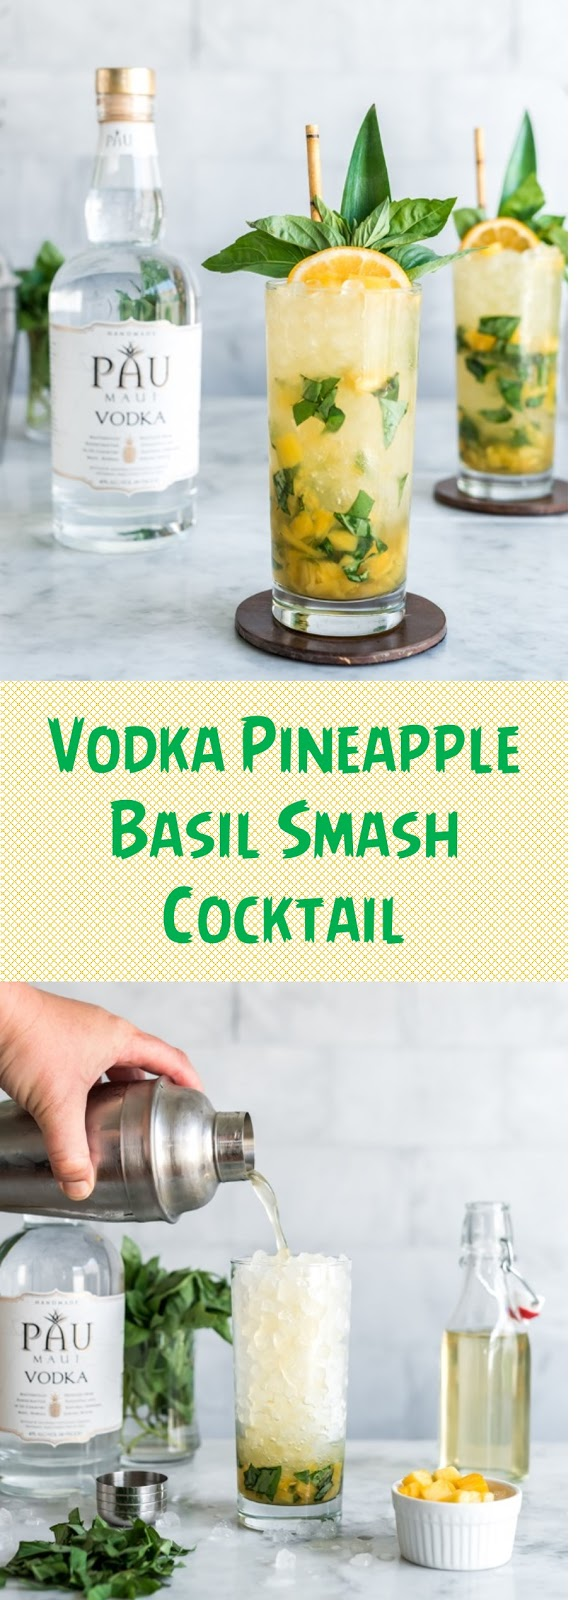 Vodka Pineapple Basil Smash Cocktail